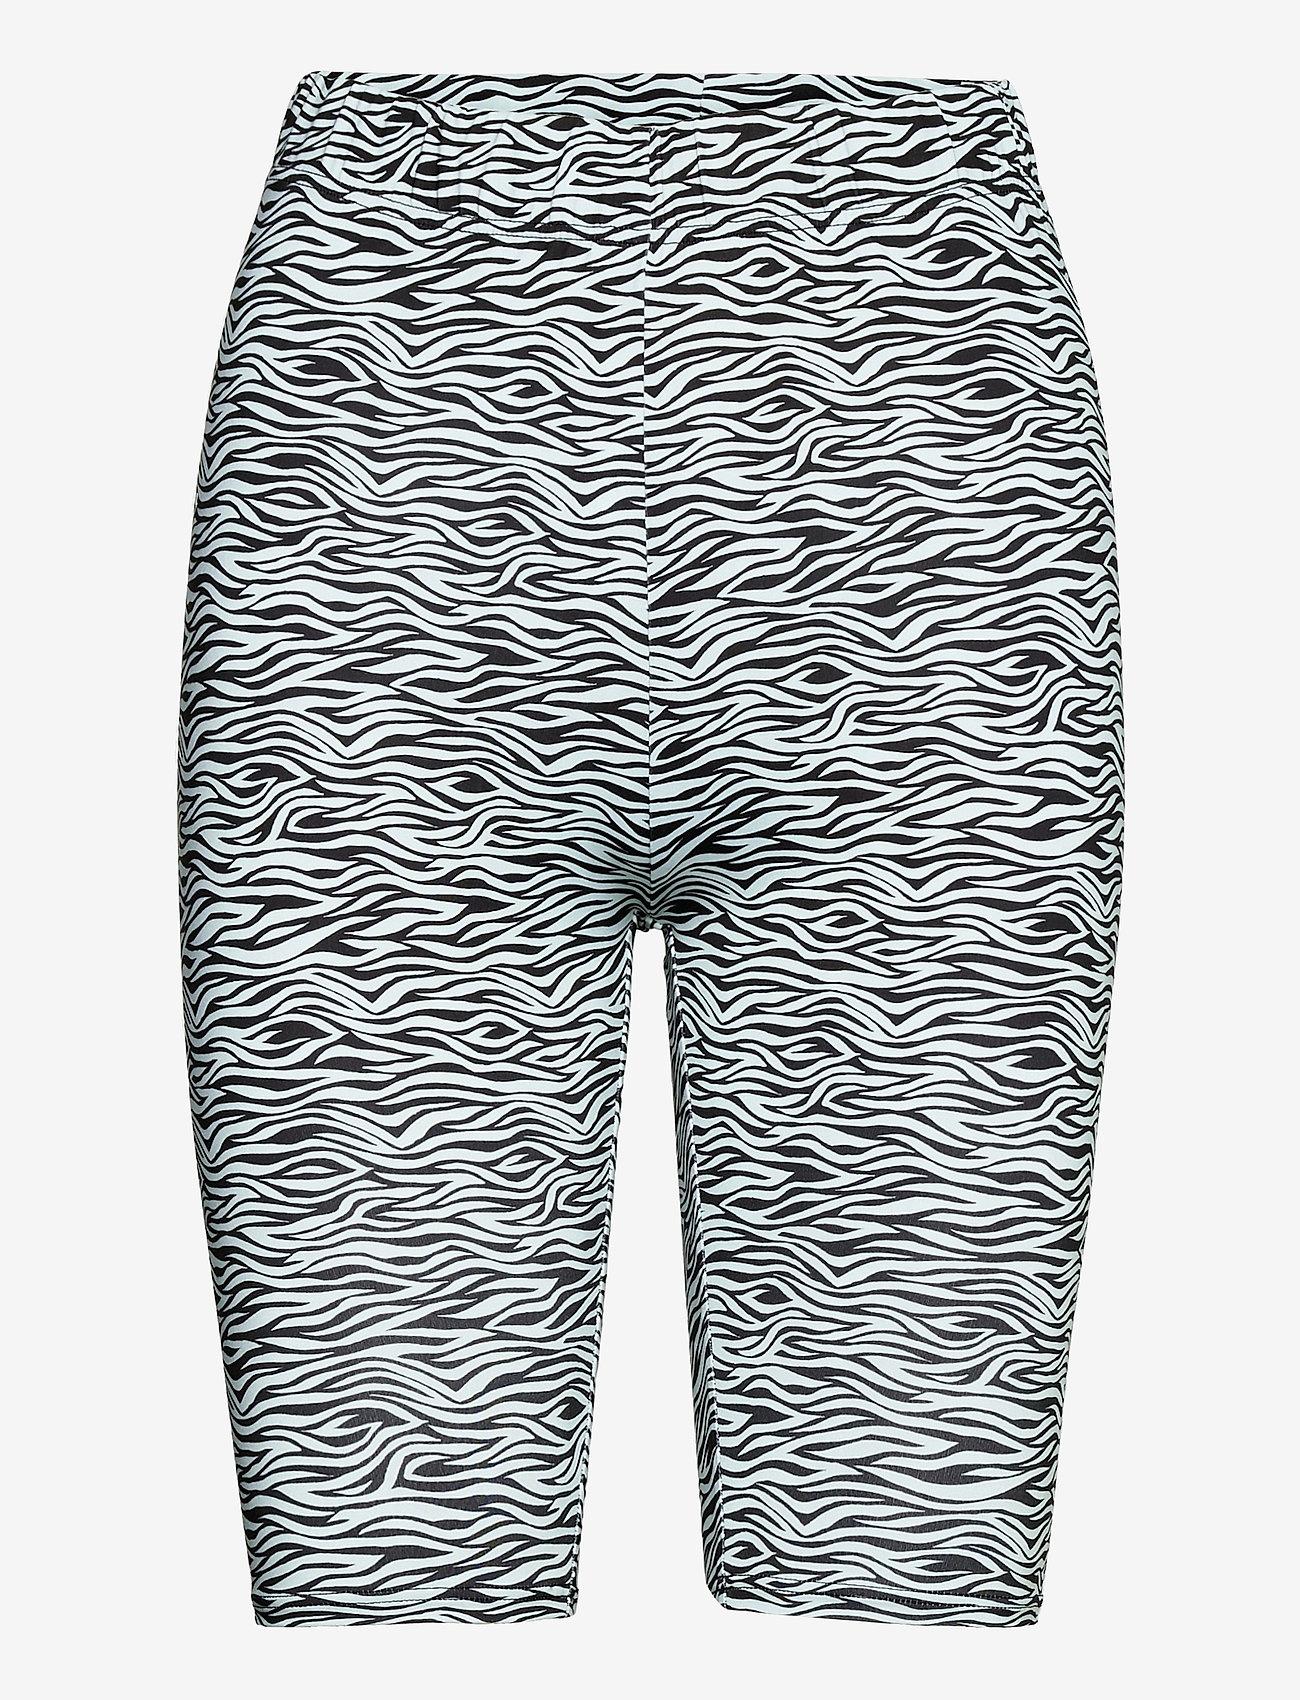 Gestuz - PiloGZ MW printed short tights - cykelshorts - grey wave - 1